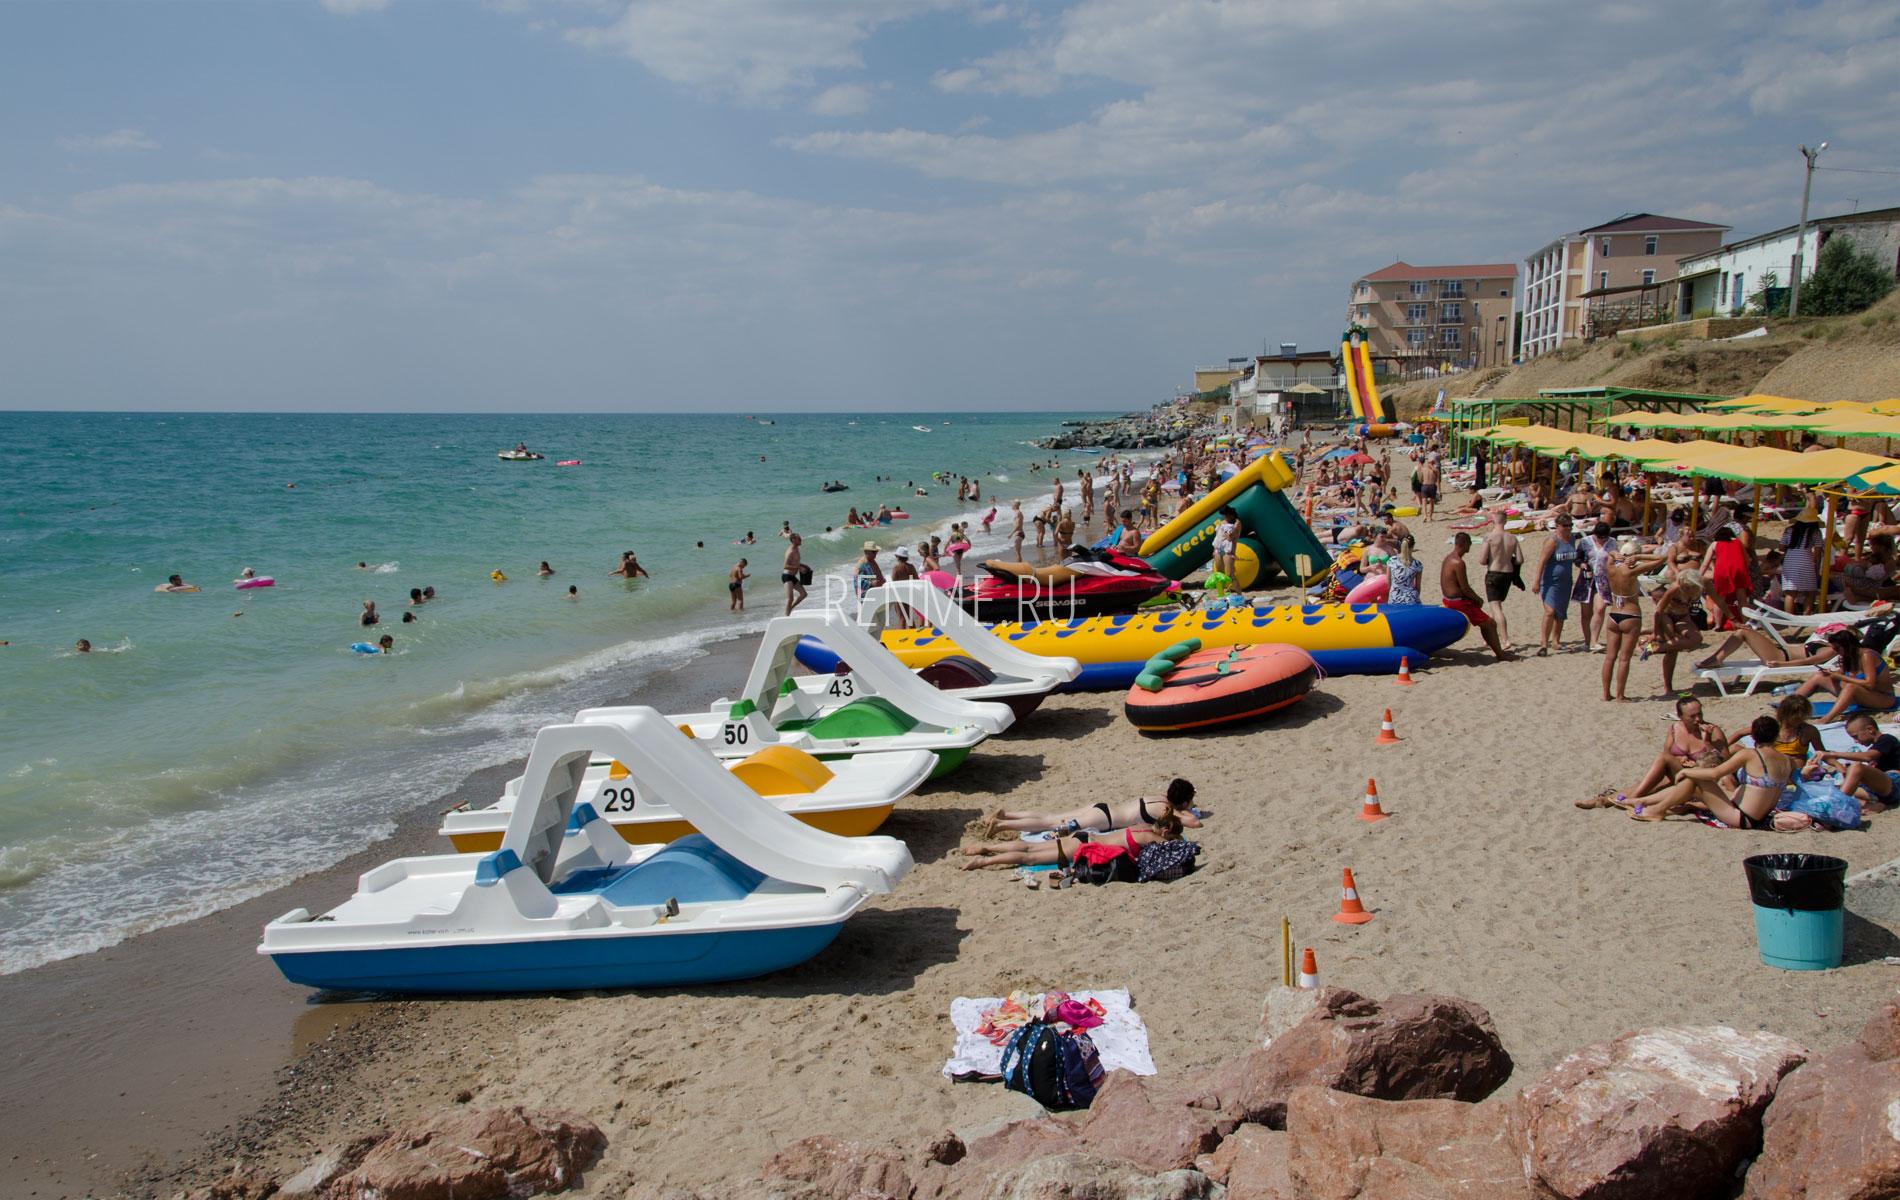 Отдых на пляже в Николаевке. Фото Николаевки